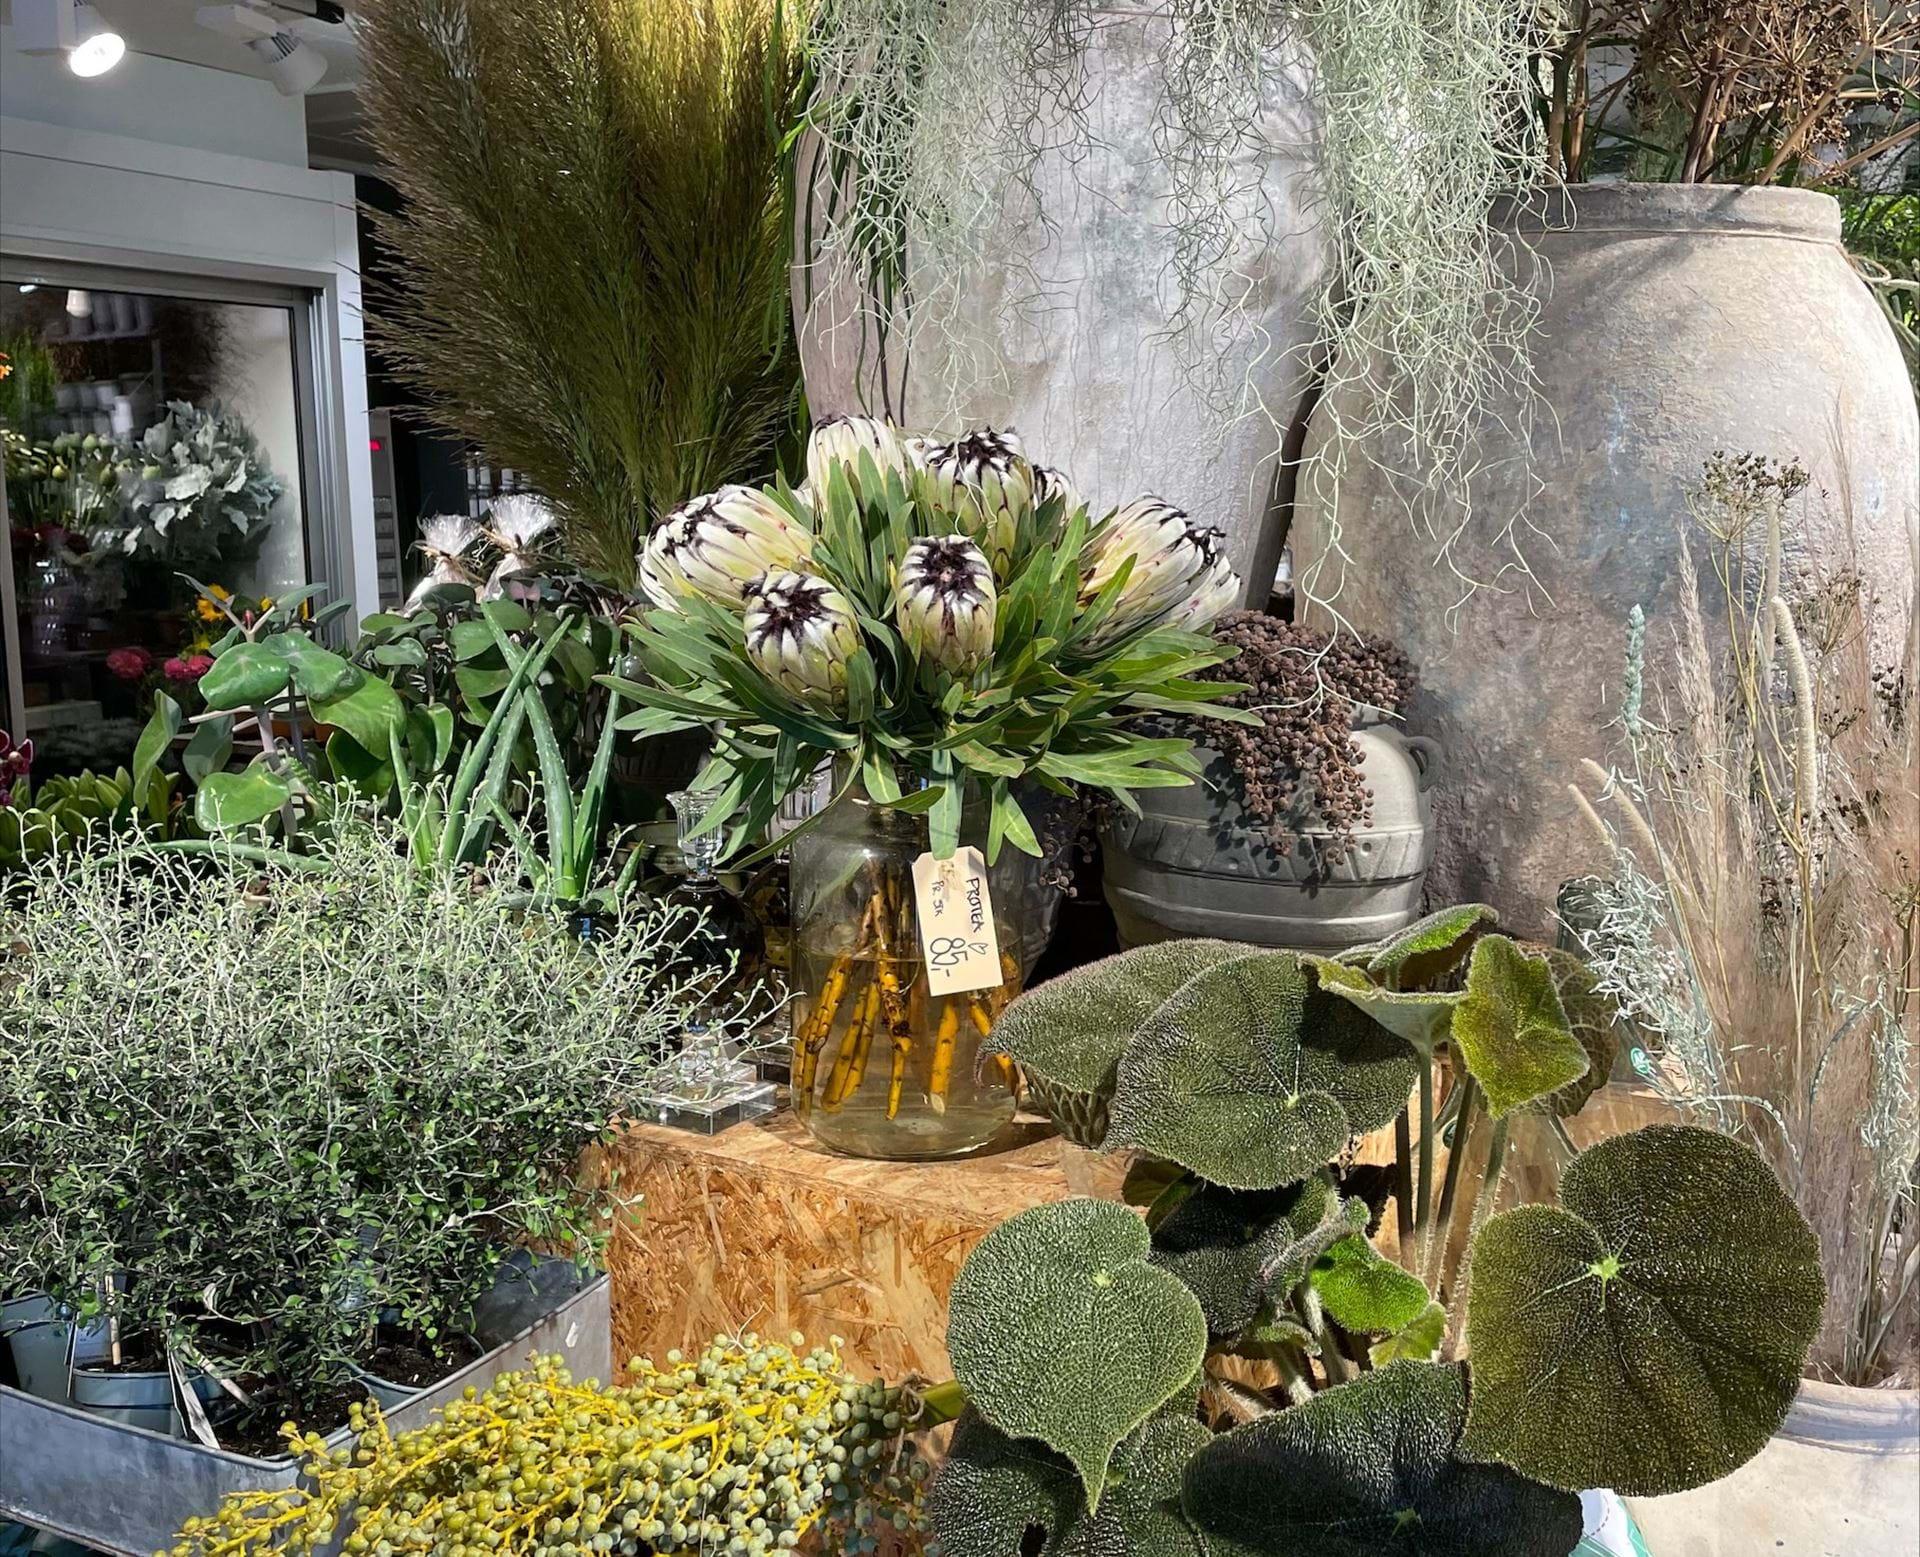 Potter med planter i står på reoler i butikken